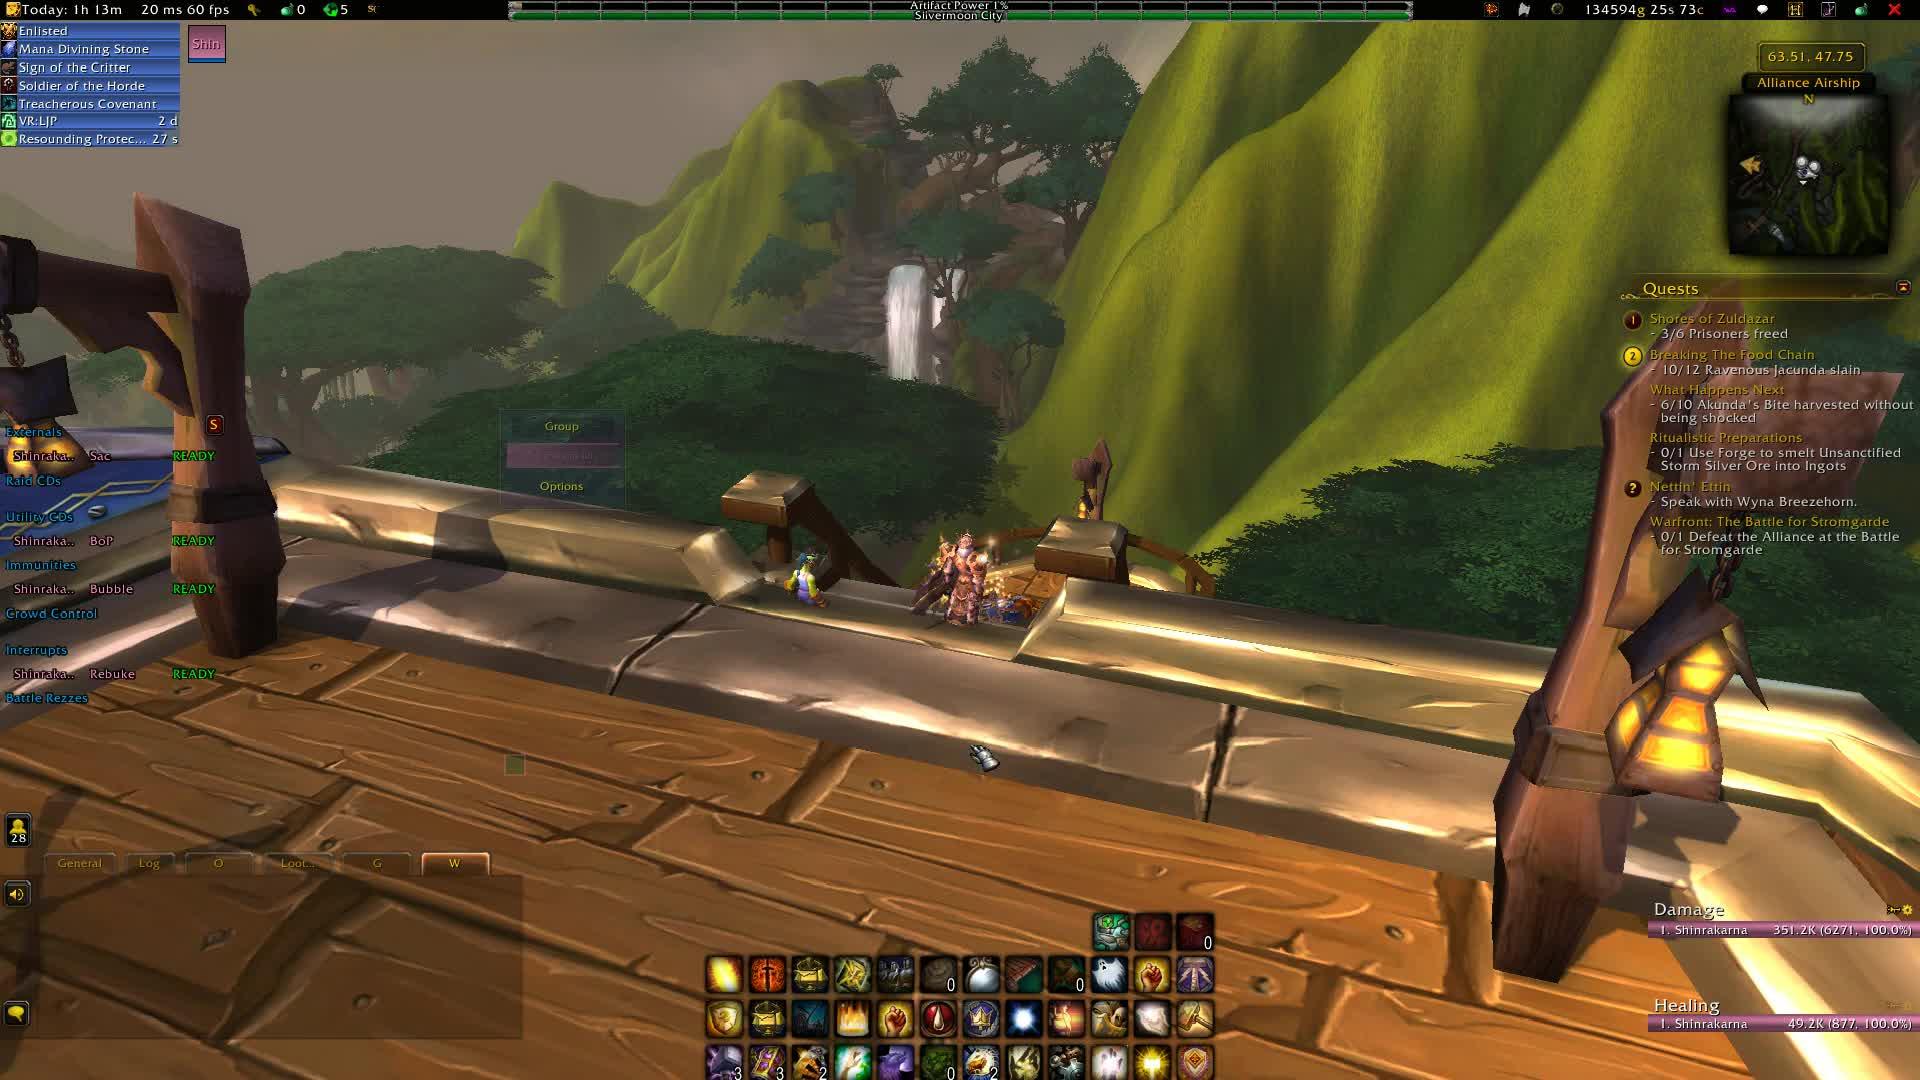 worldofwarcraft, World Of Warcraft 2019.04.07 - 20.33.41.102.DVR GIFs